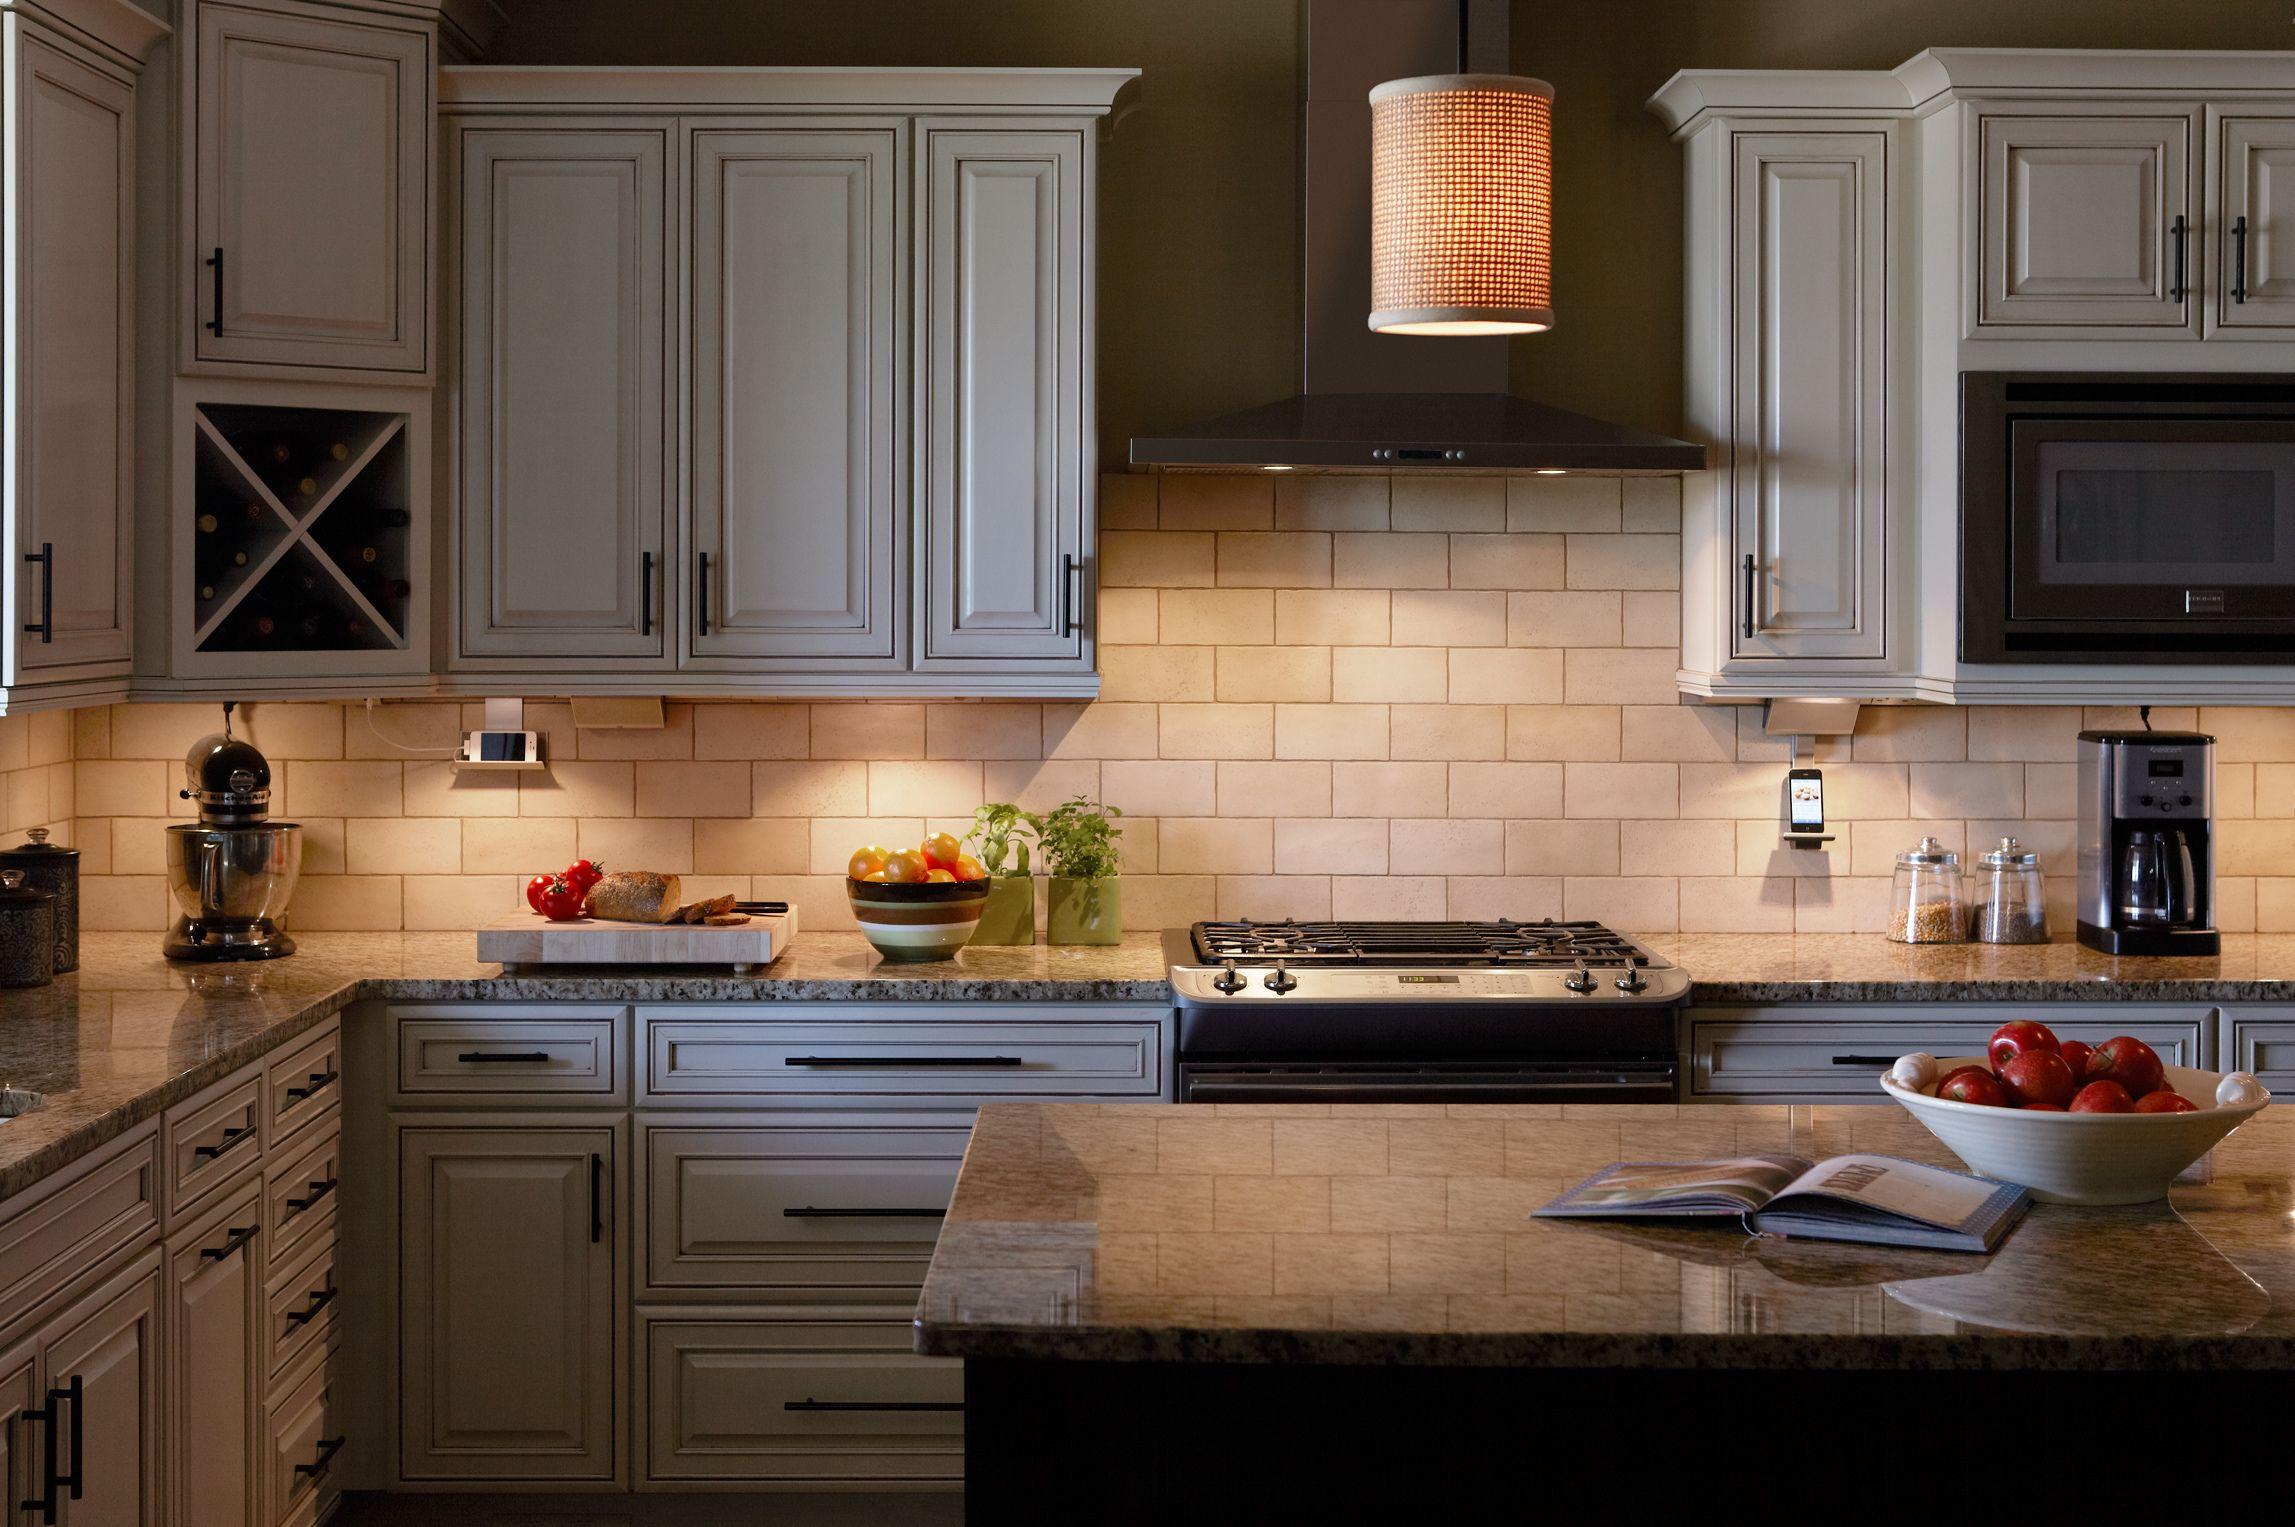 Lighting under cabinets LED Puck Linear Lights Designed by Donna